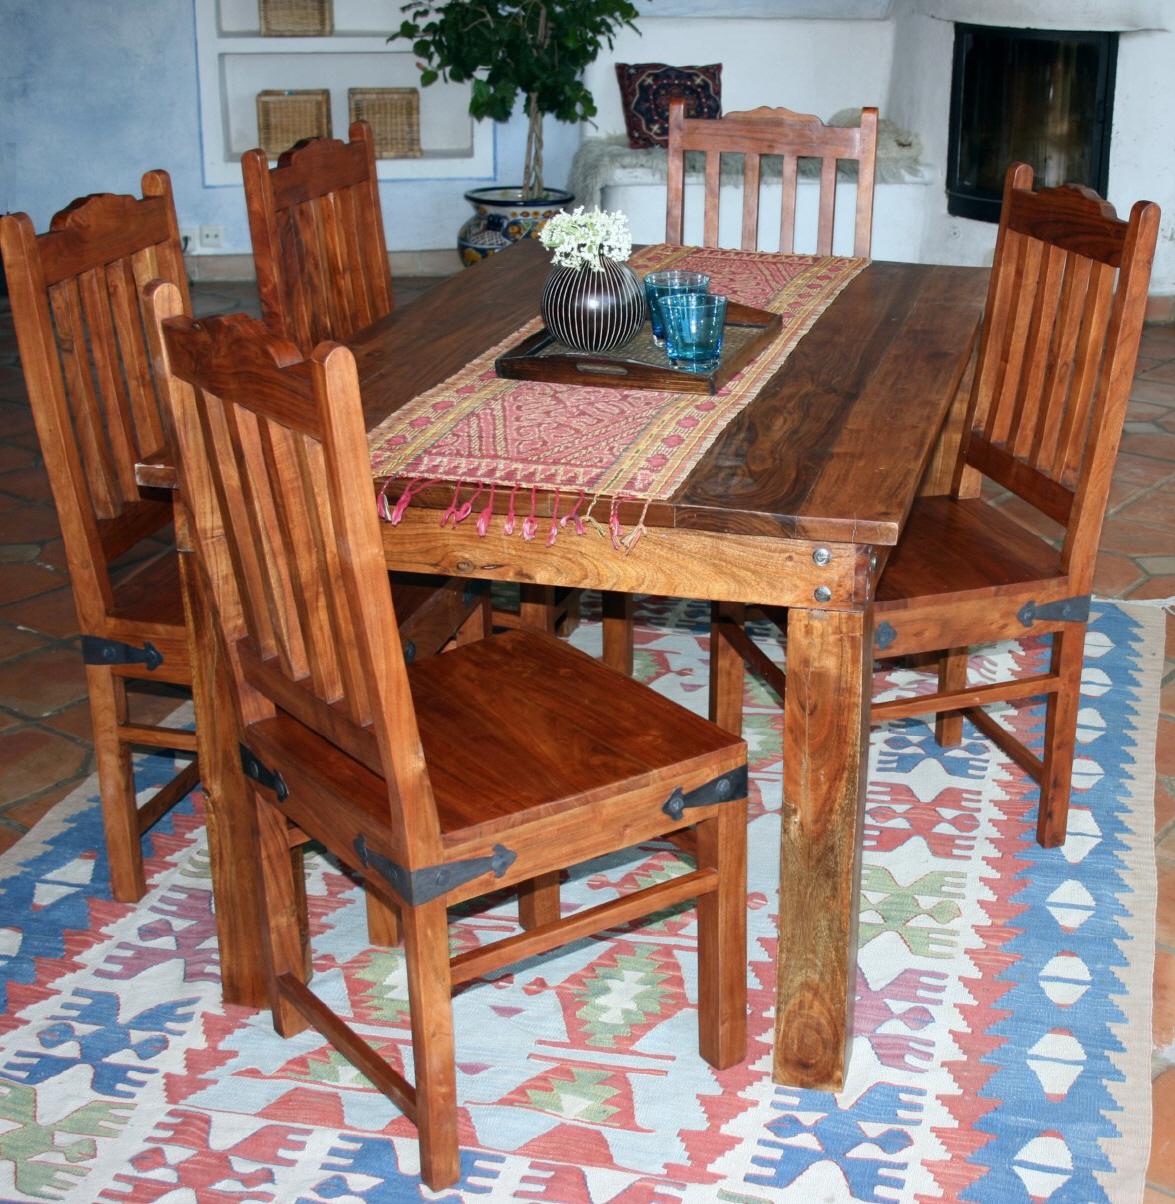 kolonialstil esstisch r509 hell ohne beschl ge. Black Bedroom Furniture Sets. Home Design Ideas